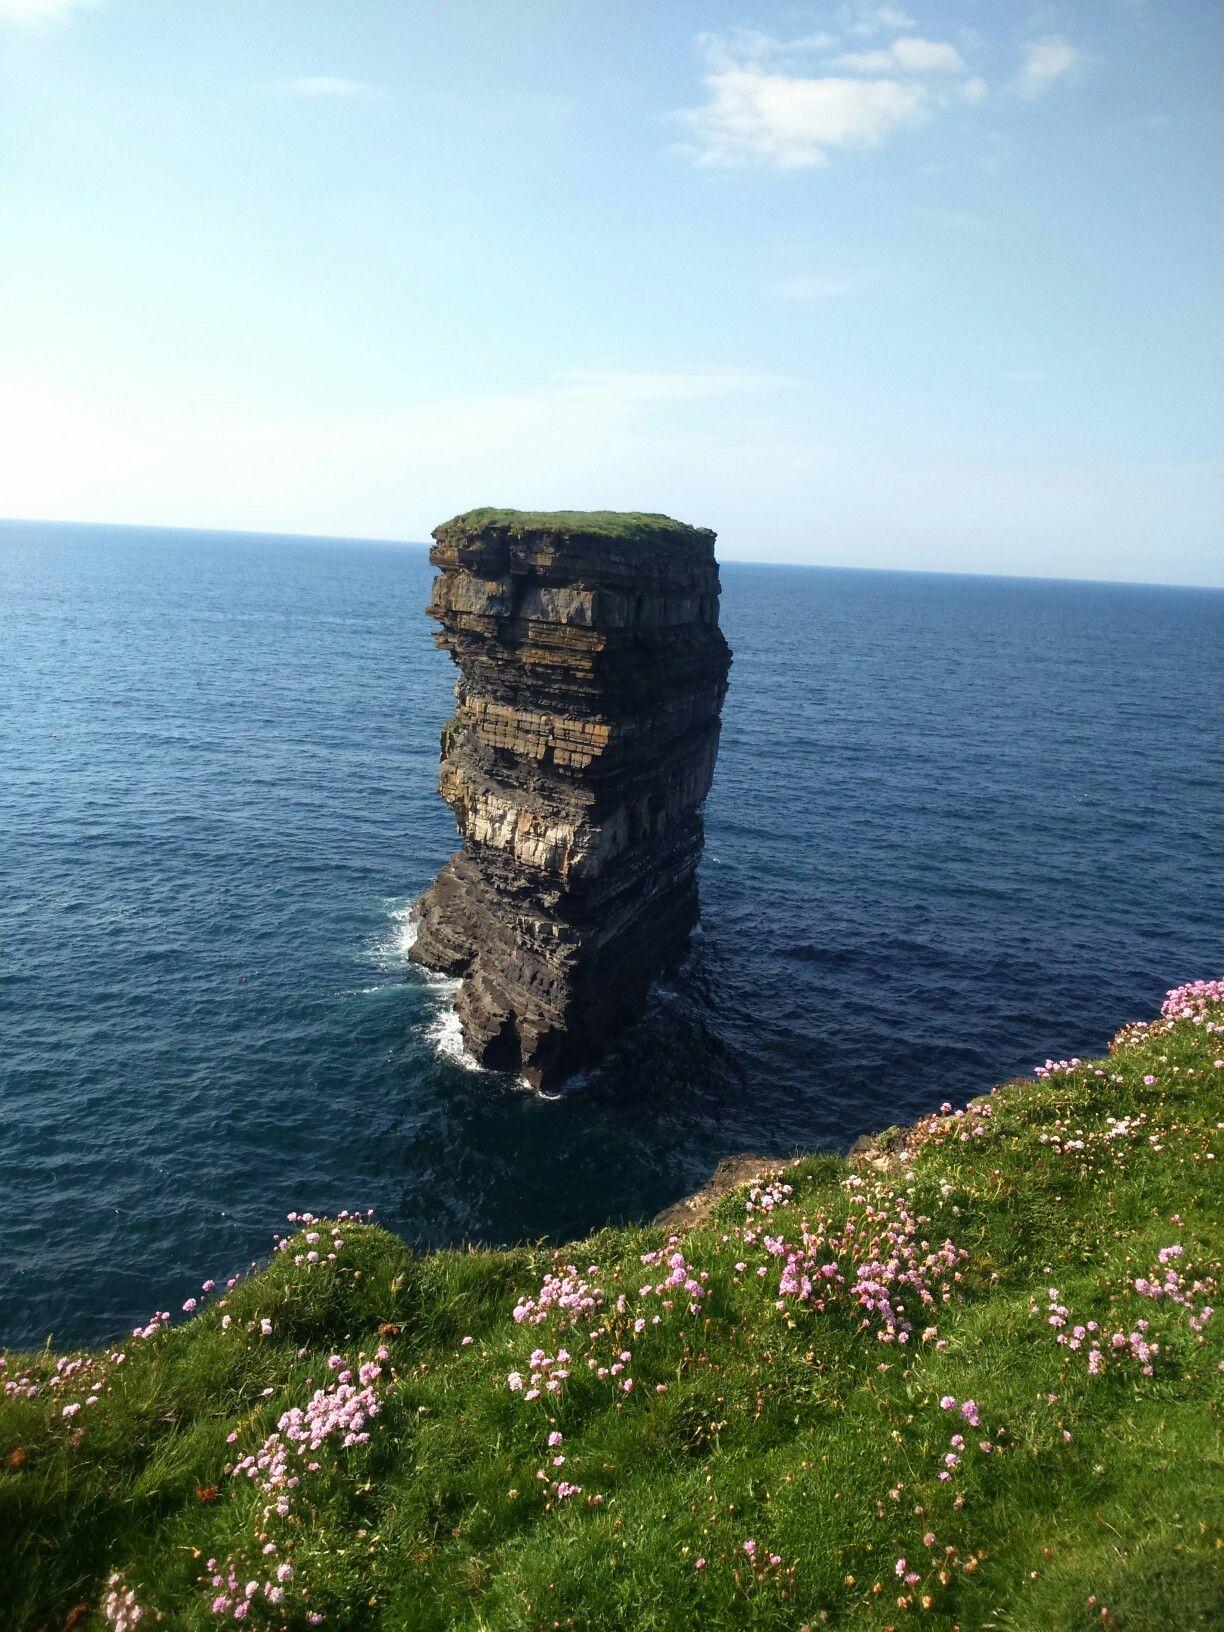 Pin by Bernadette Sweeney on beautiful Ireland (With